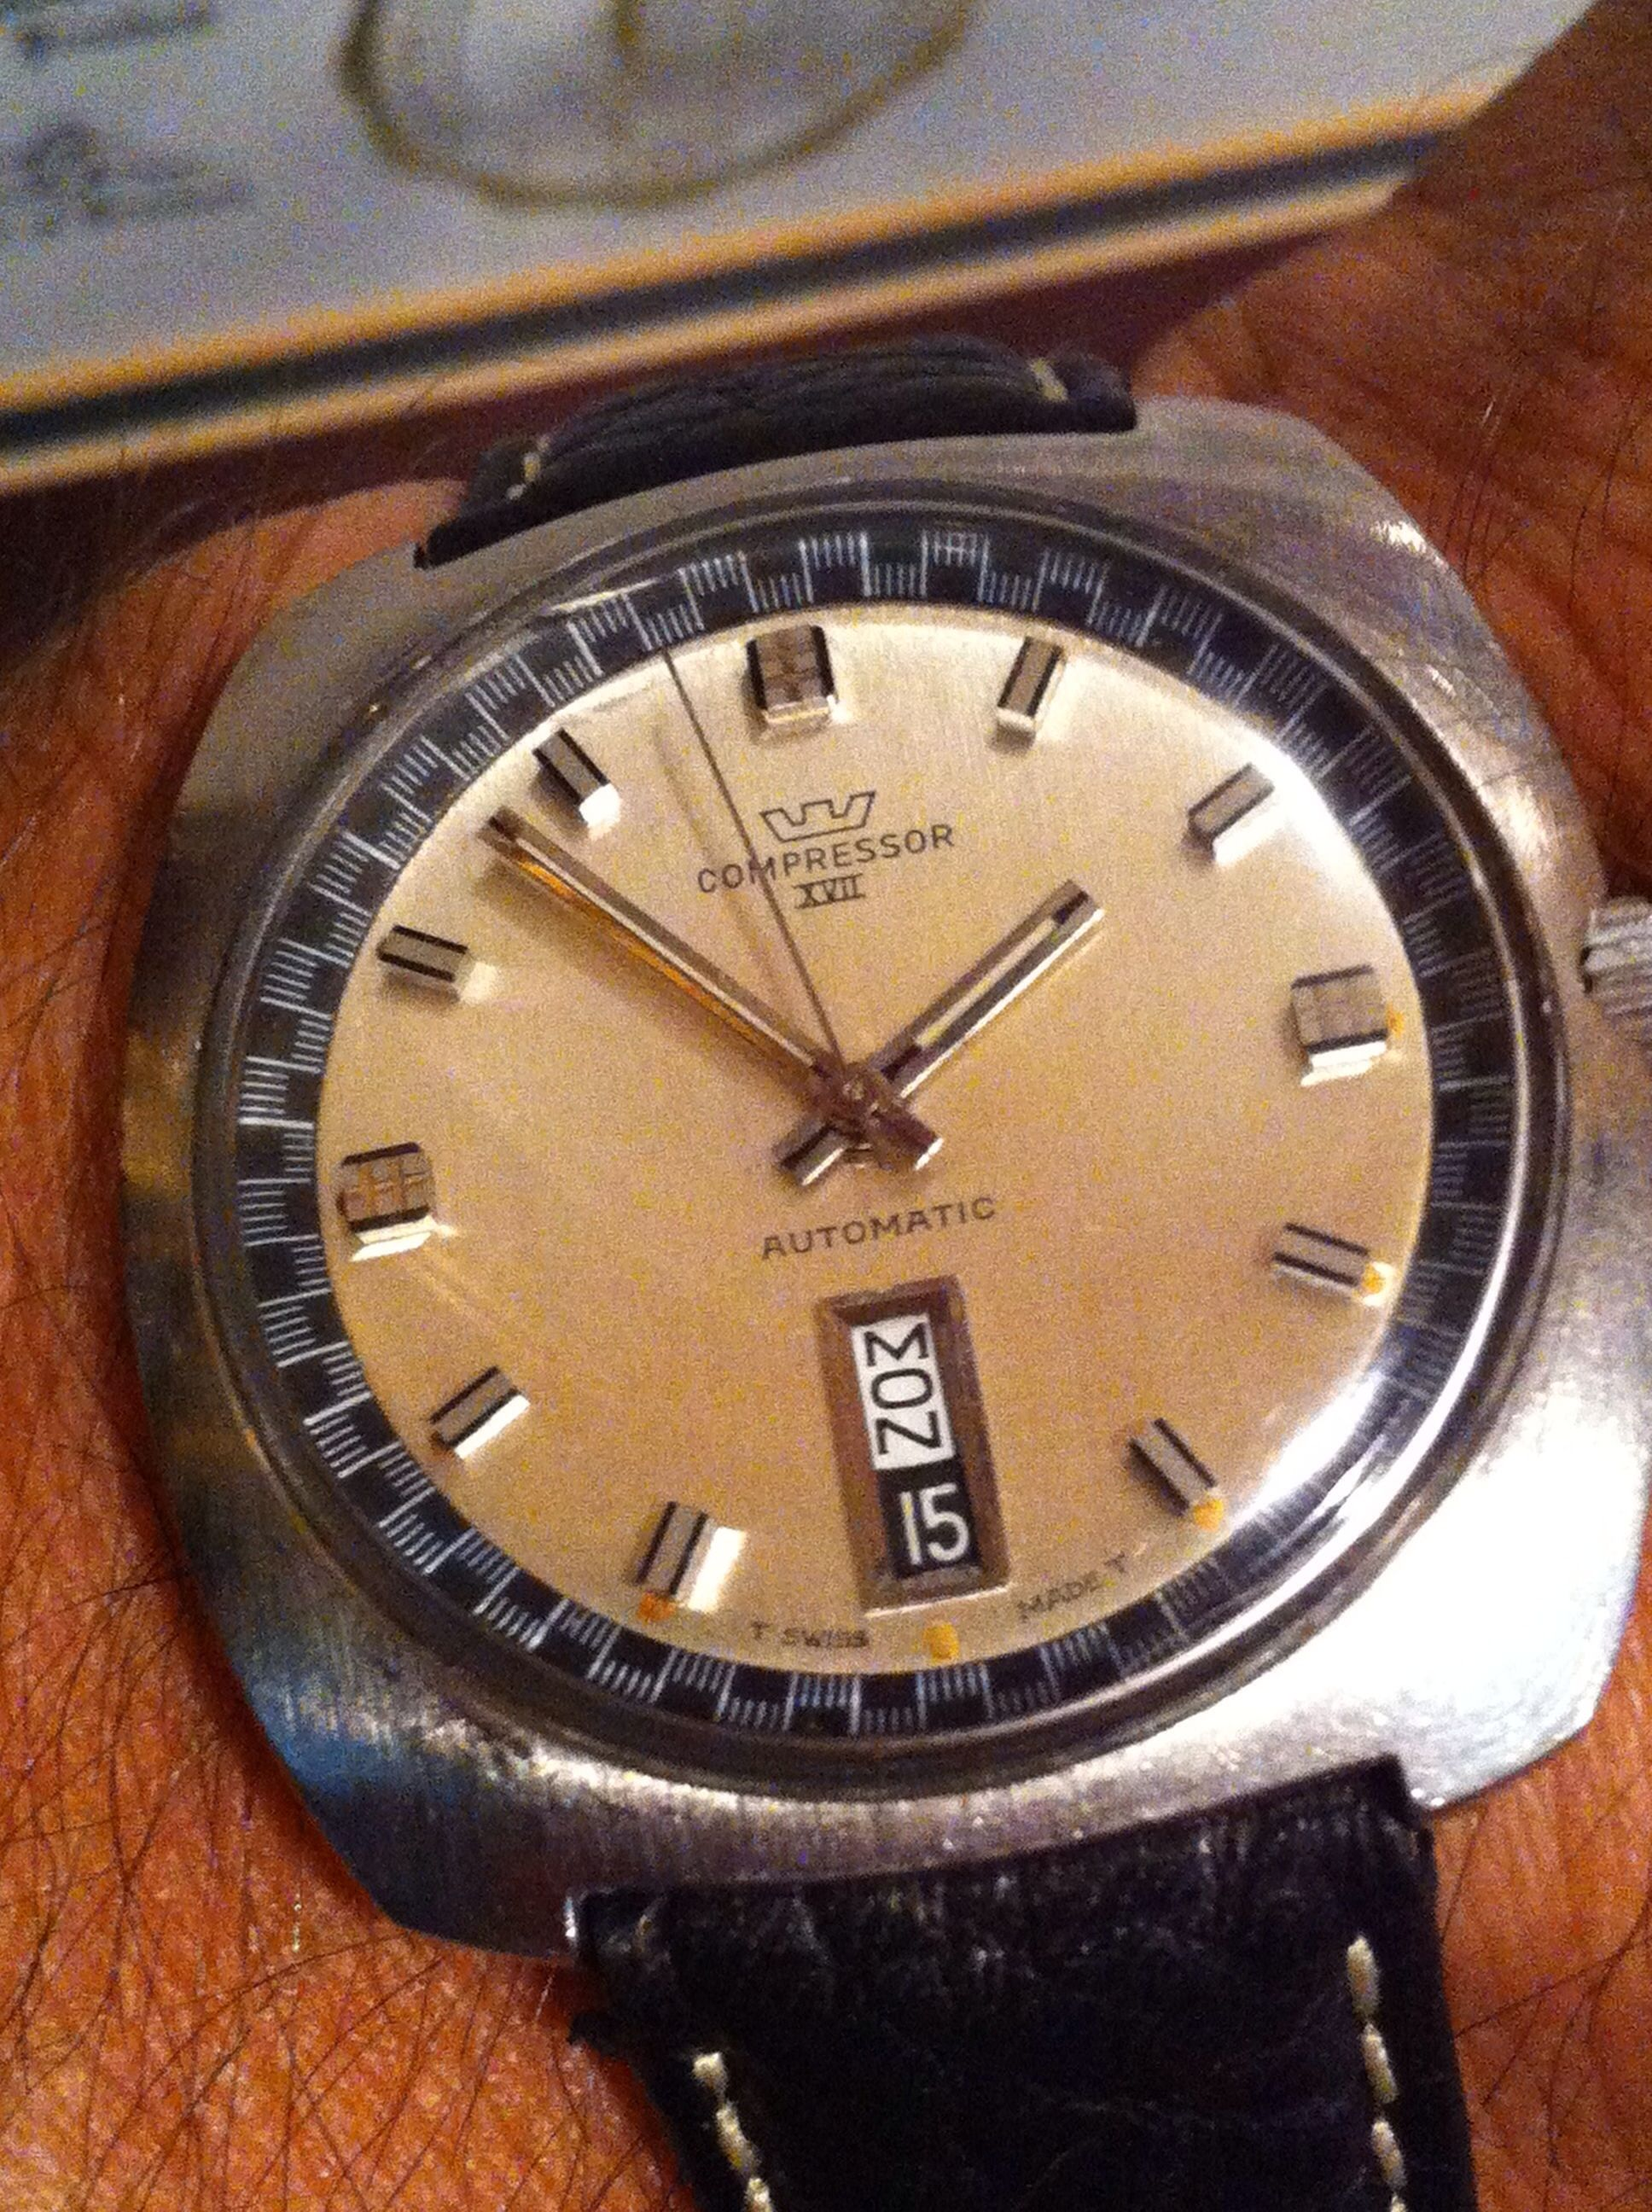 Glycine Compressor circa 1960s Watch collection, Sport